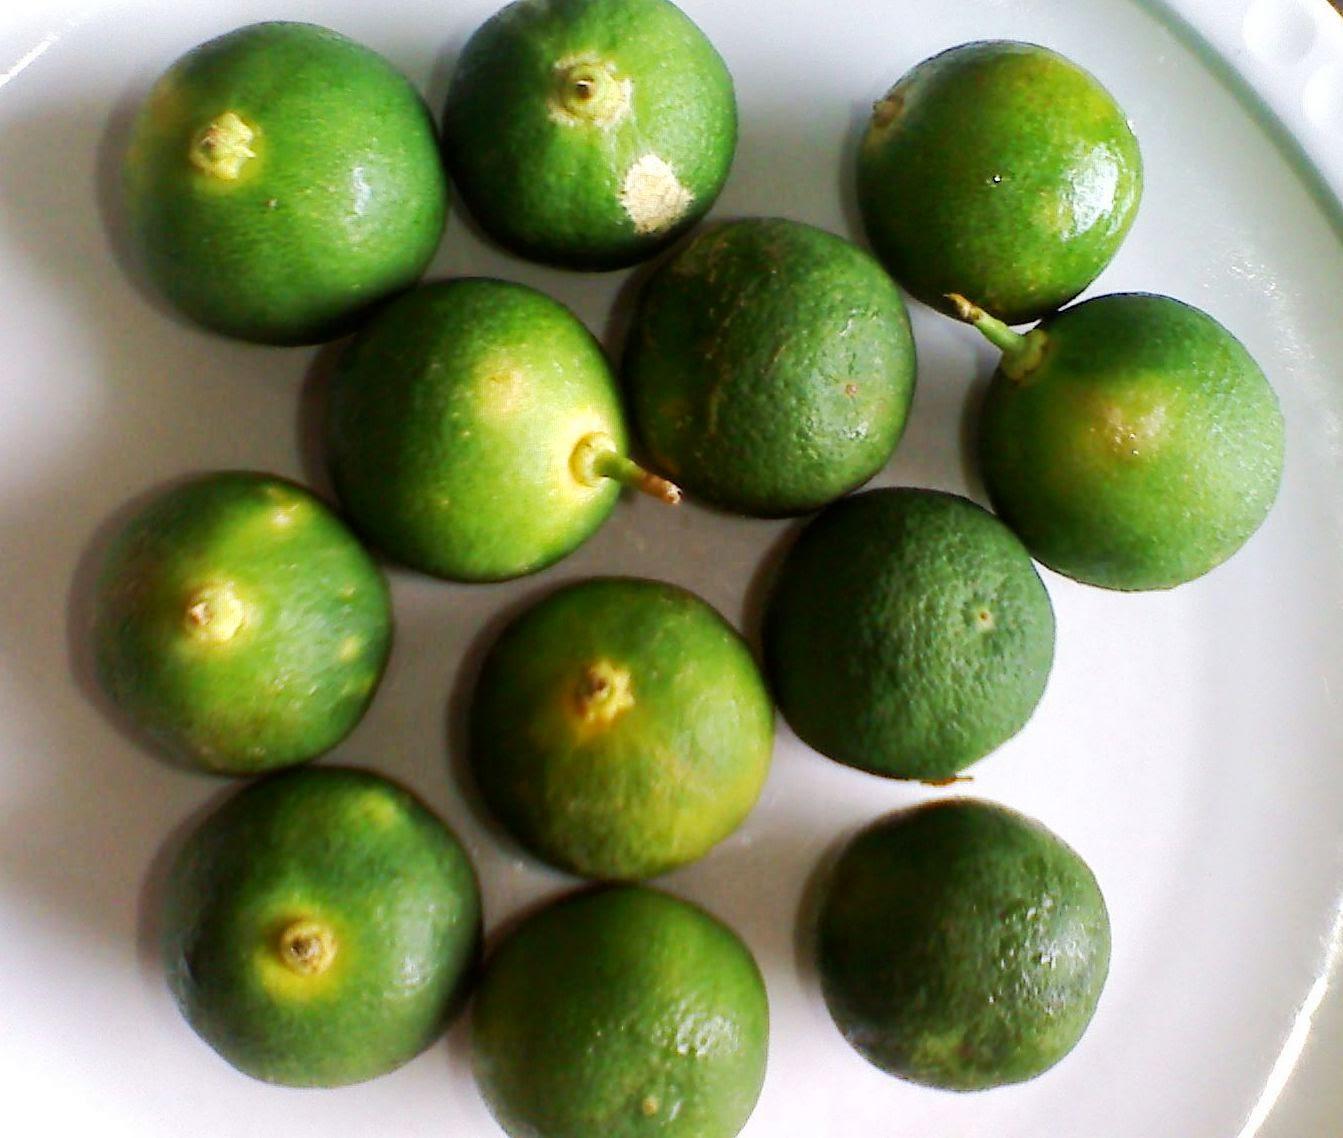 Kumpulan resep masakan online lemon cui